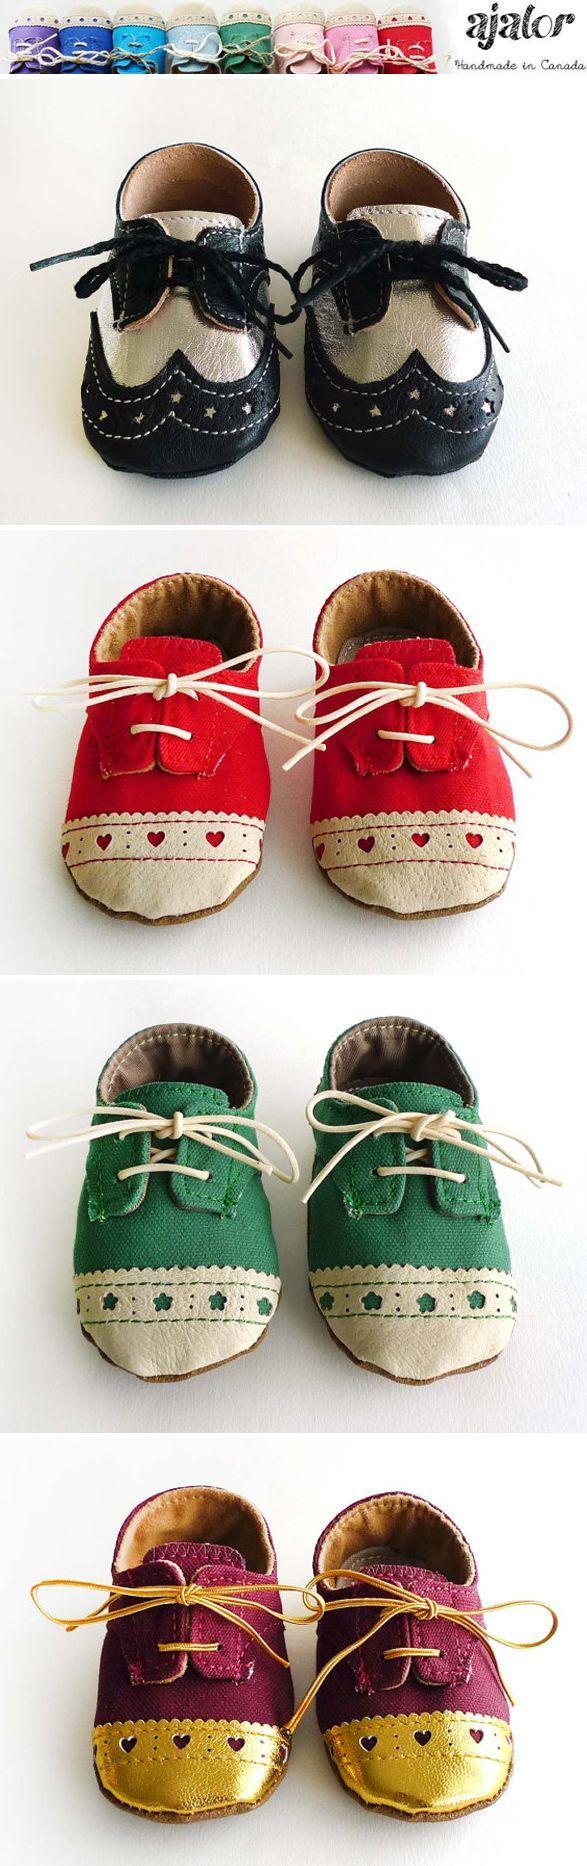 25 Best Ideas About Handmade Baby On Pinterest Handmade